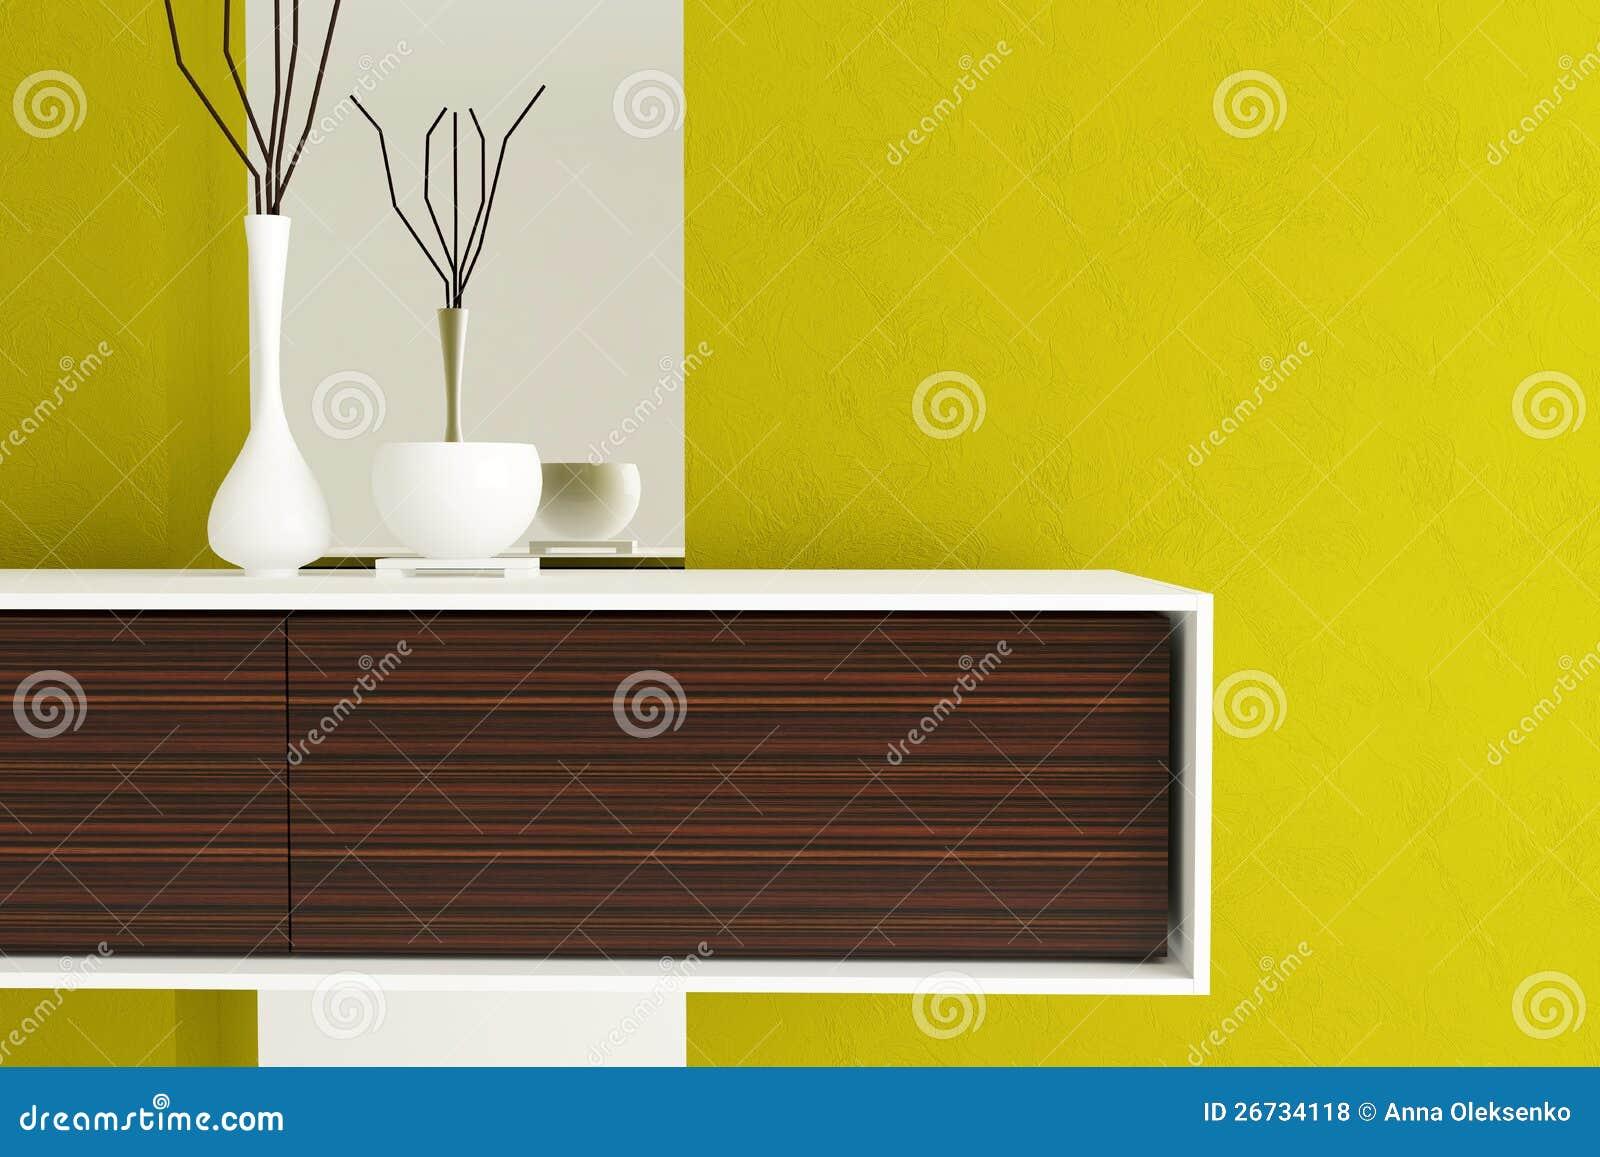 Interior Design Royalty Free Stock Photos Image 26734118